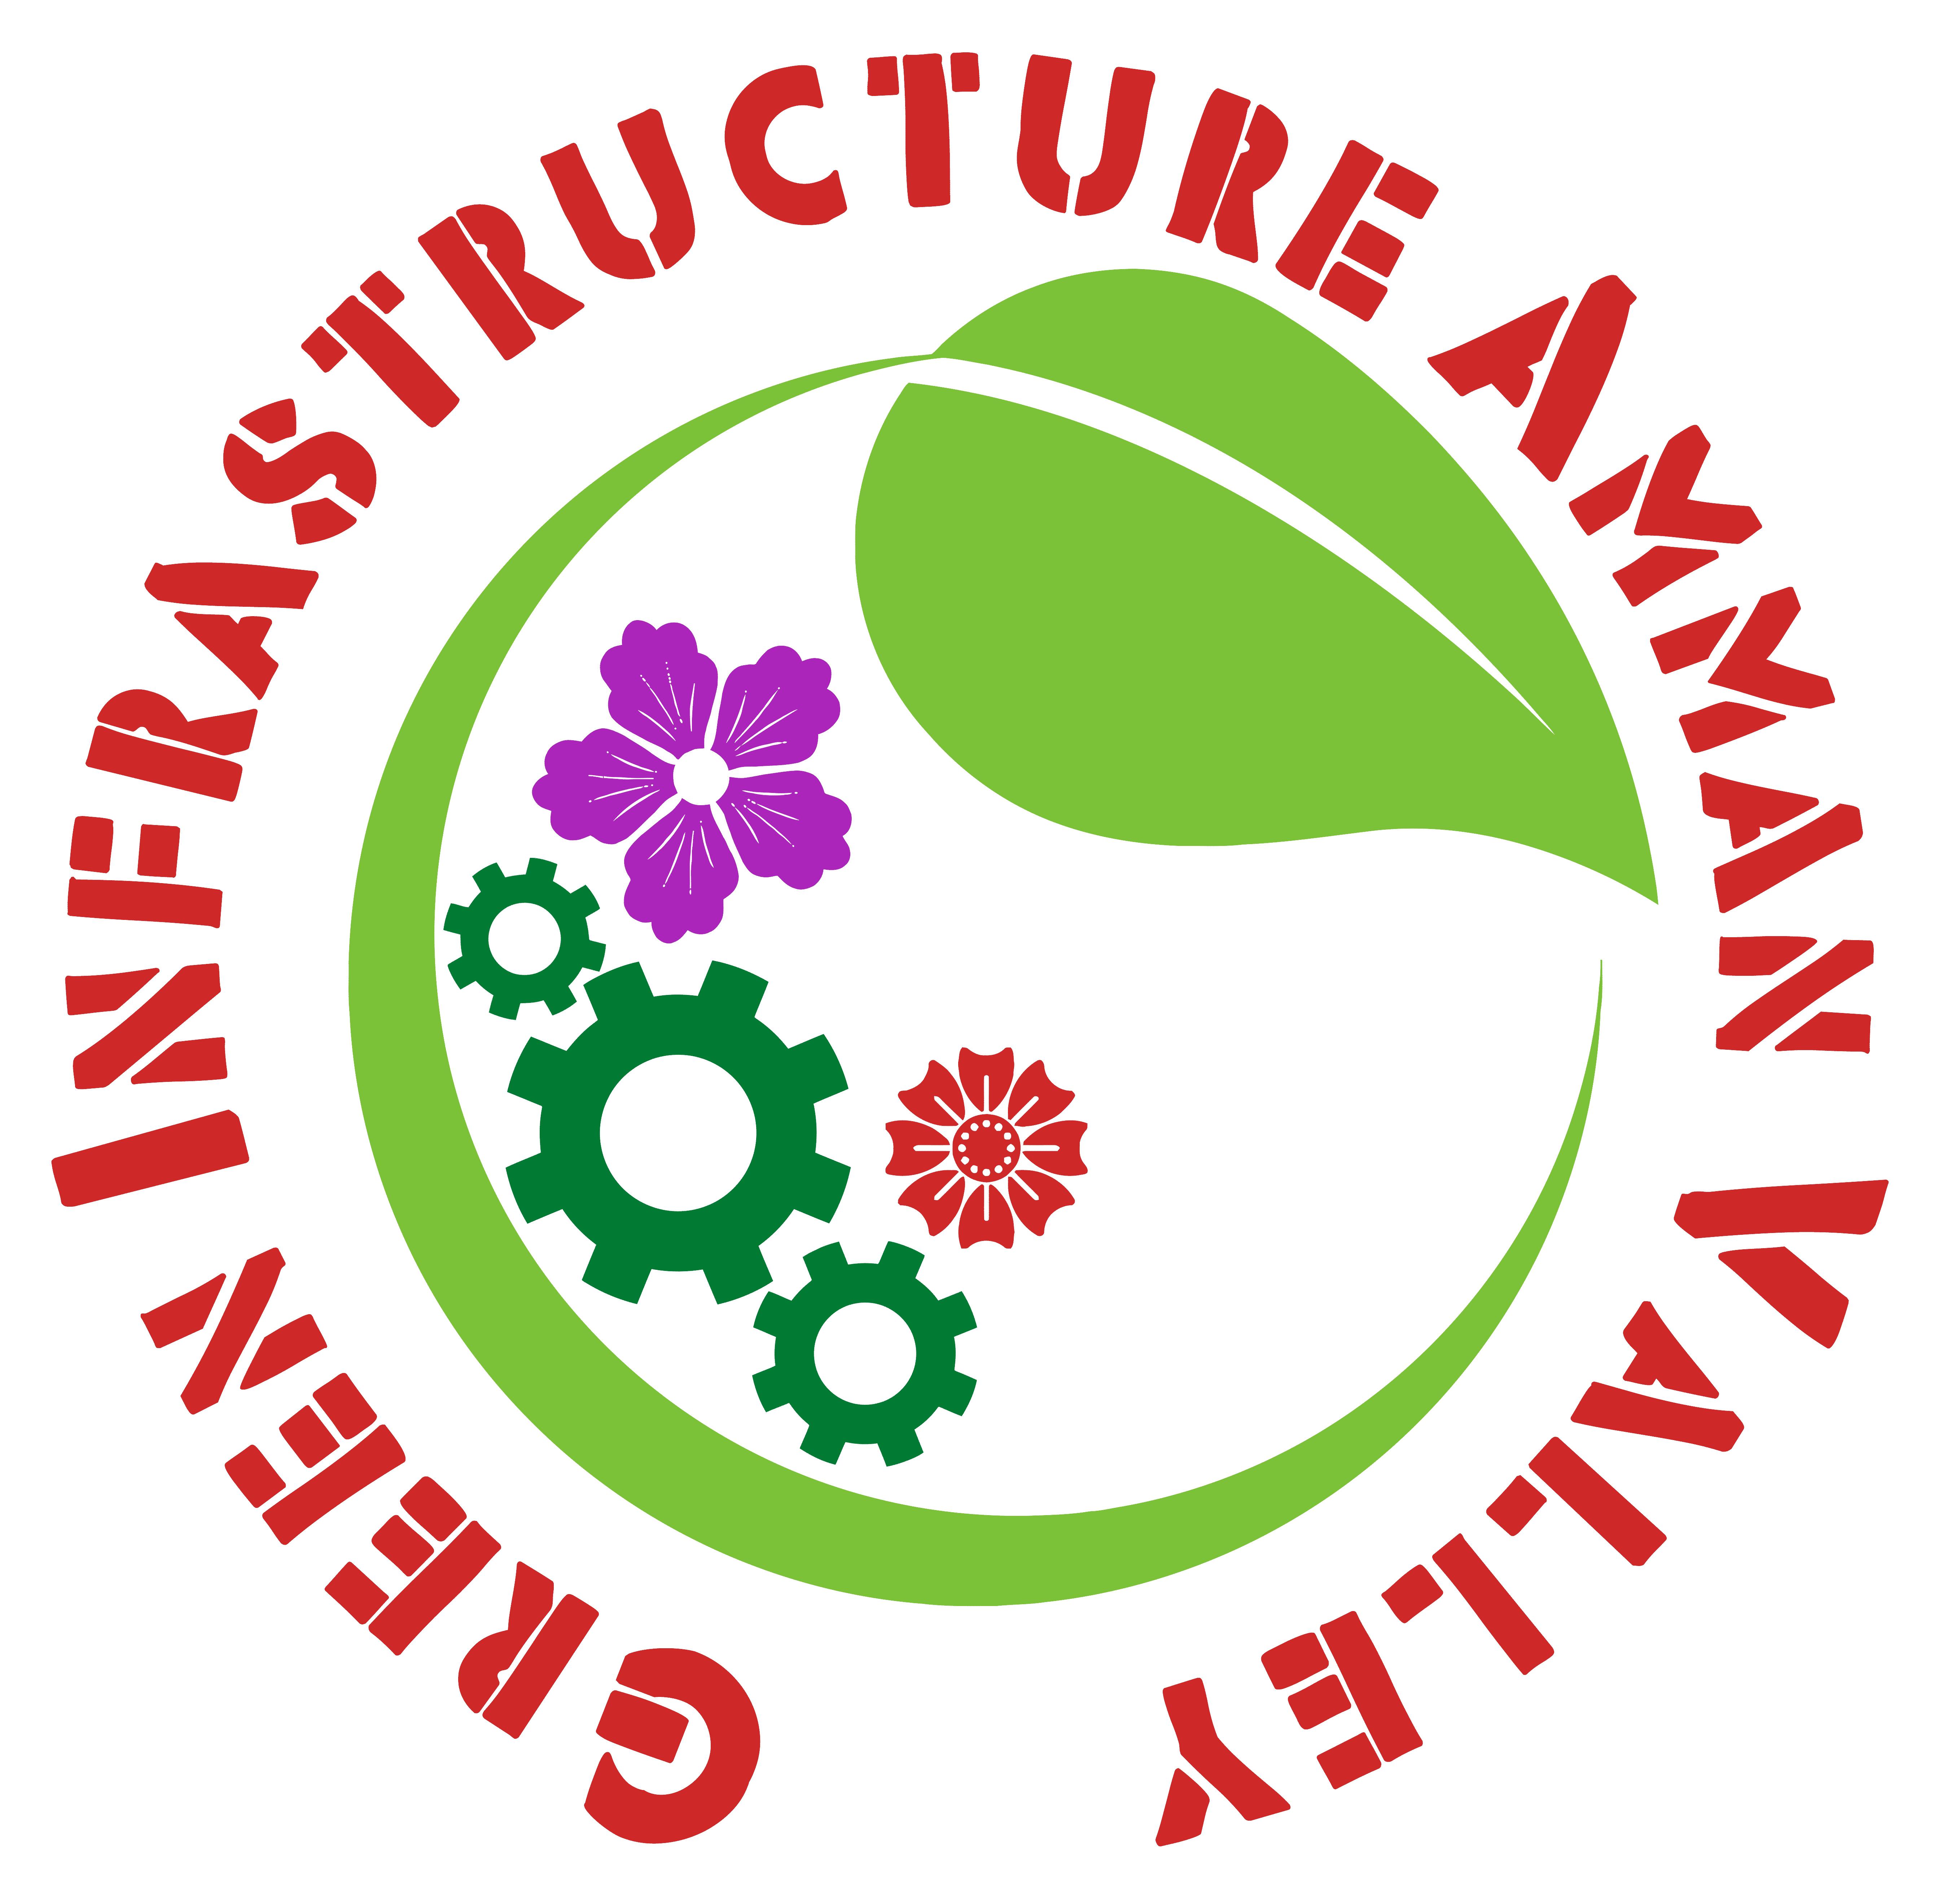 Green Infrastructure Amman Valley Circular Logo